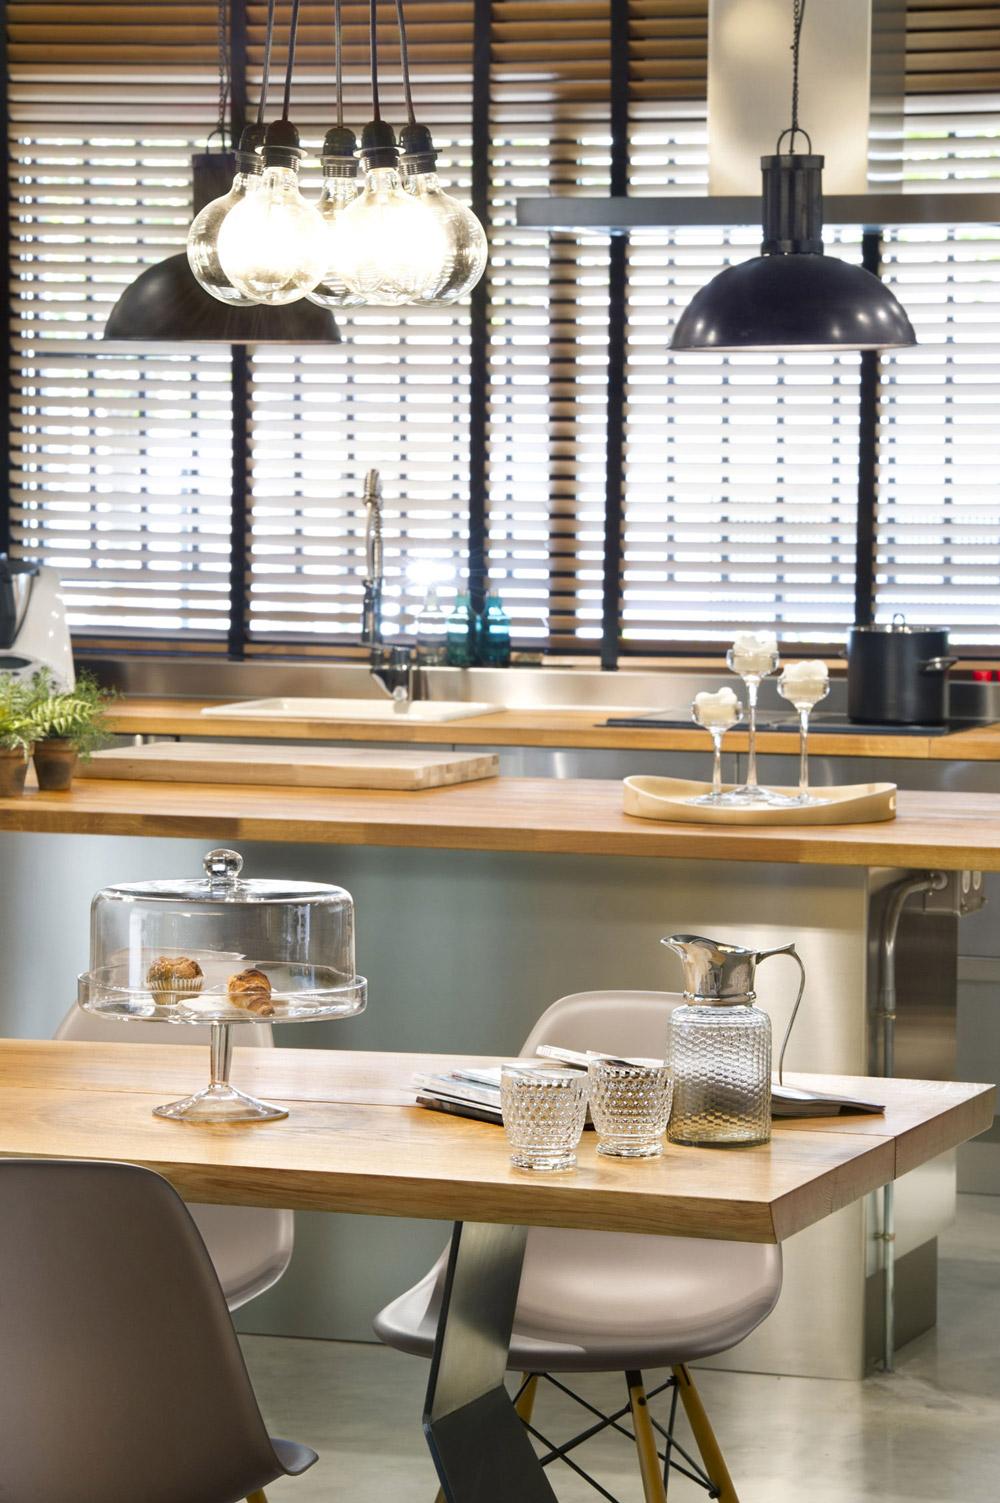 Dining Table, Kitchen, Pendant Lighting, Loft Style Home in Terrassa, Spain